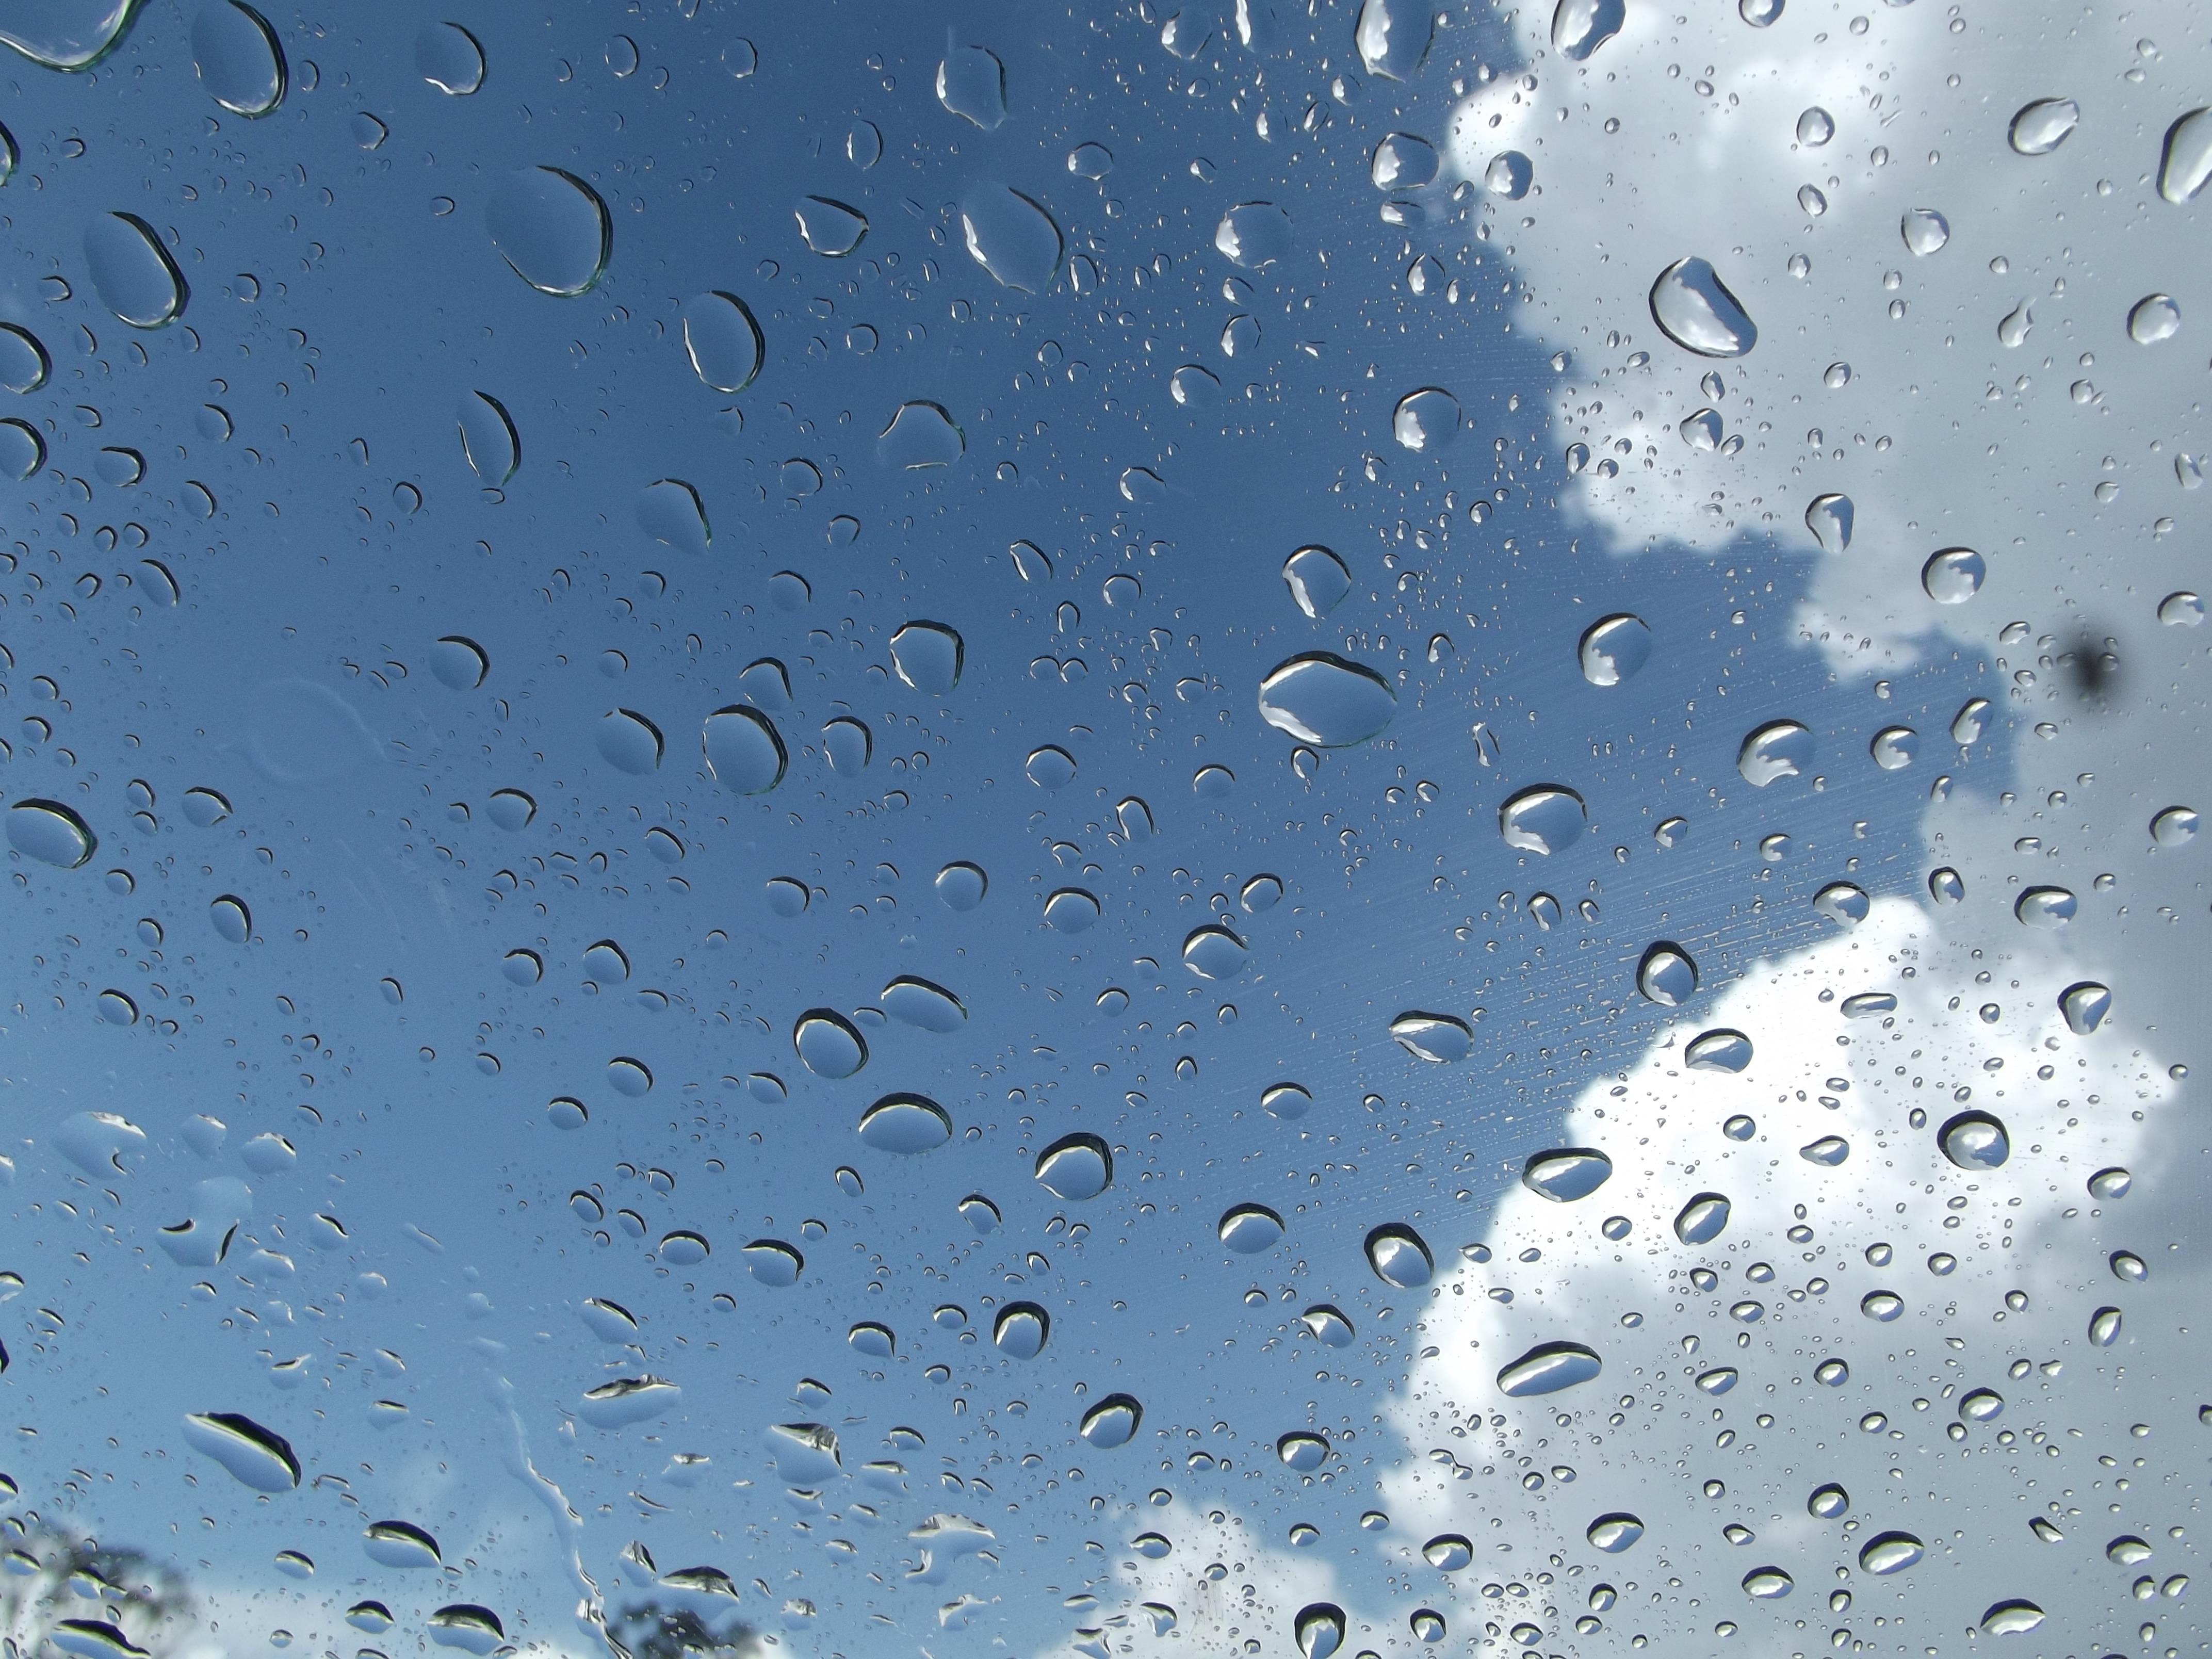 Gambar Air Penurunan Awan Hujan Daun Embun Beku Cuaca Awan